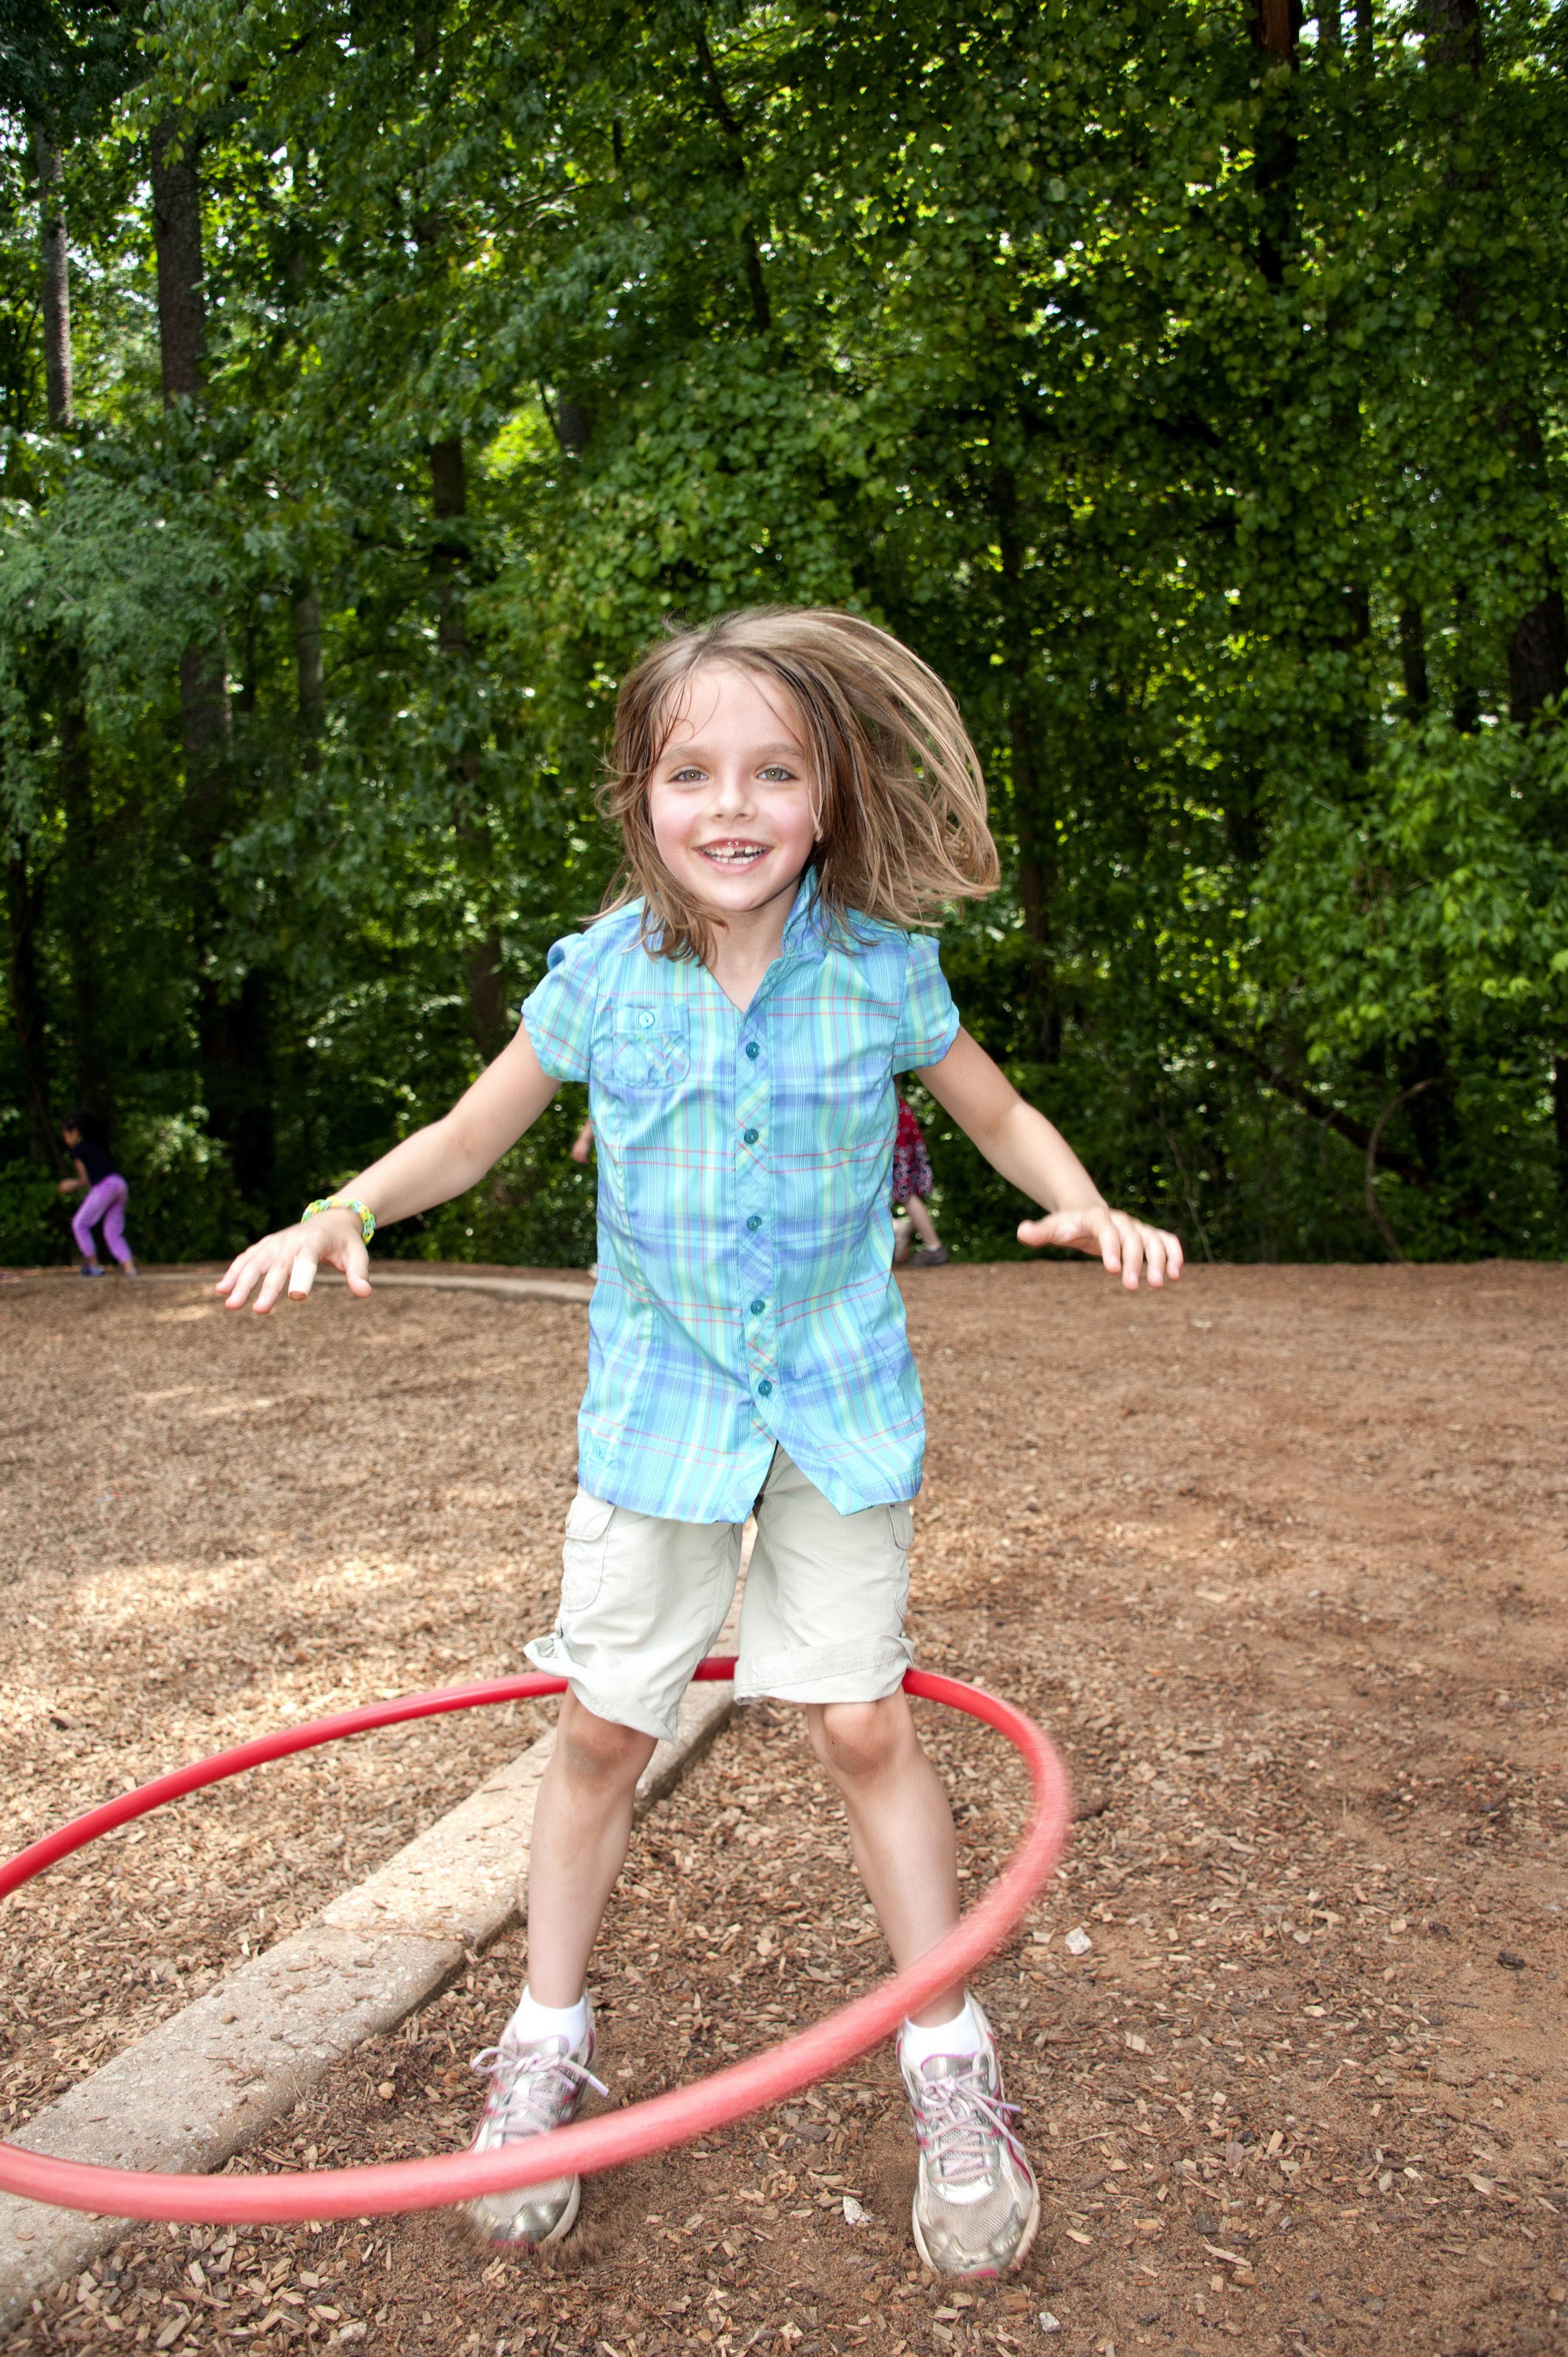 Free photograph; young, girl, having, fun, enjoying, time, spinning, hula, hoop, waist, schoolyard